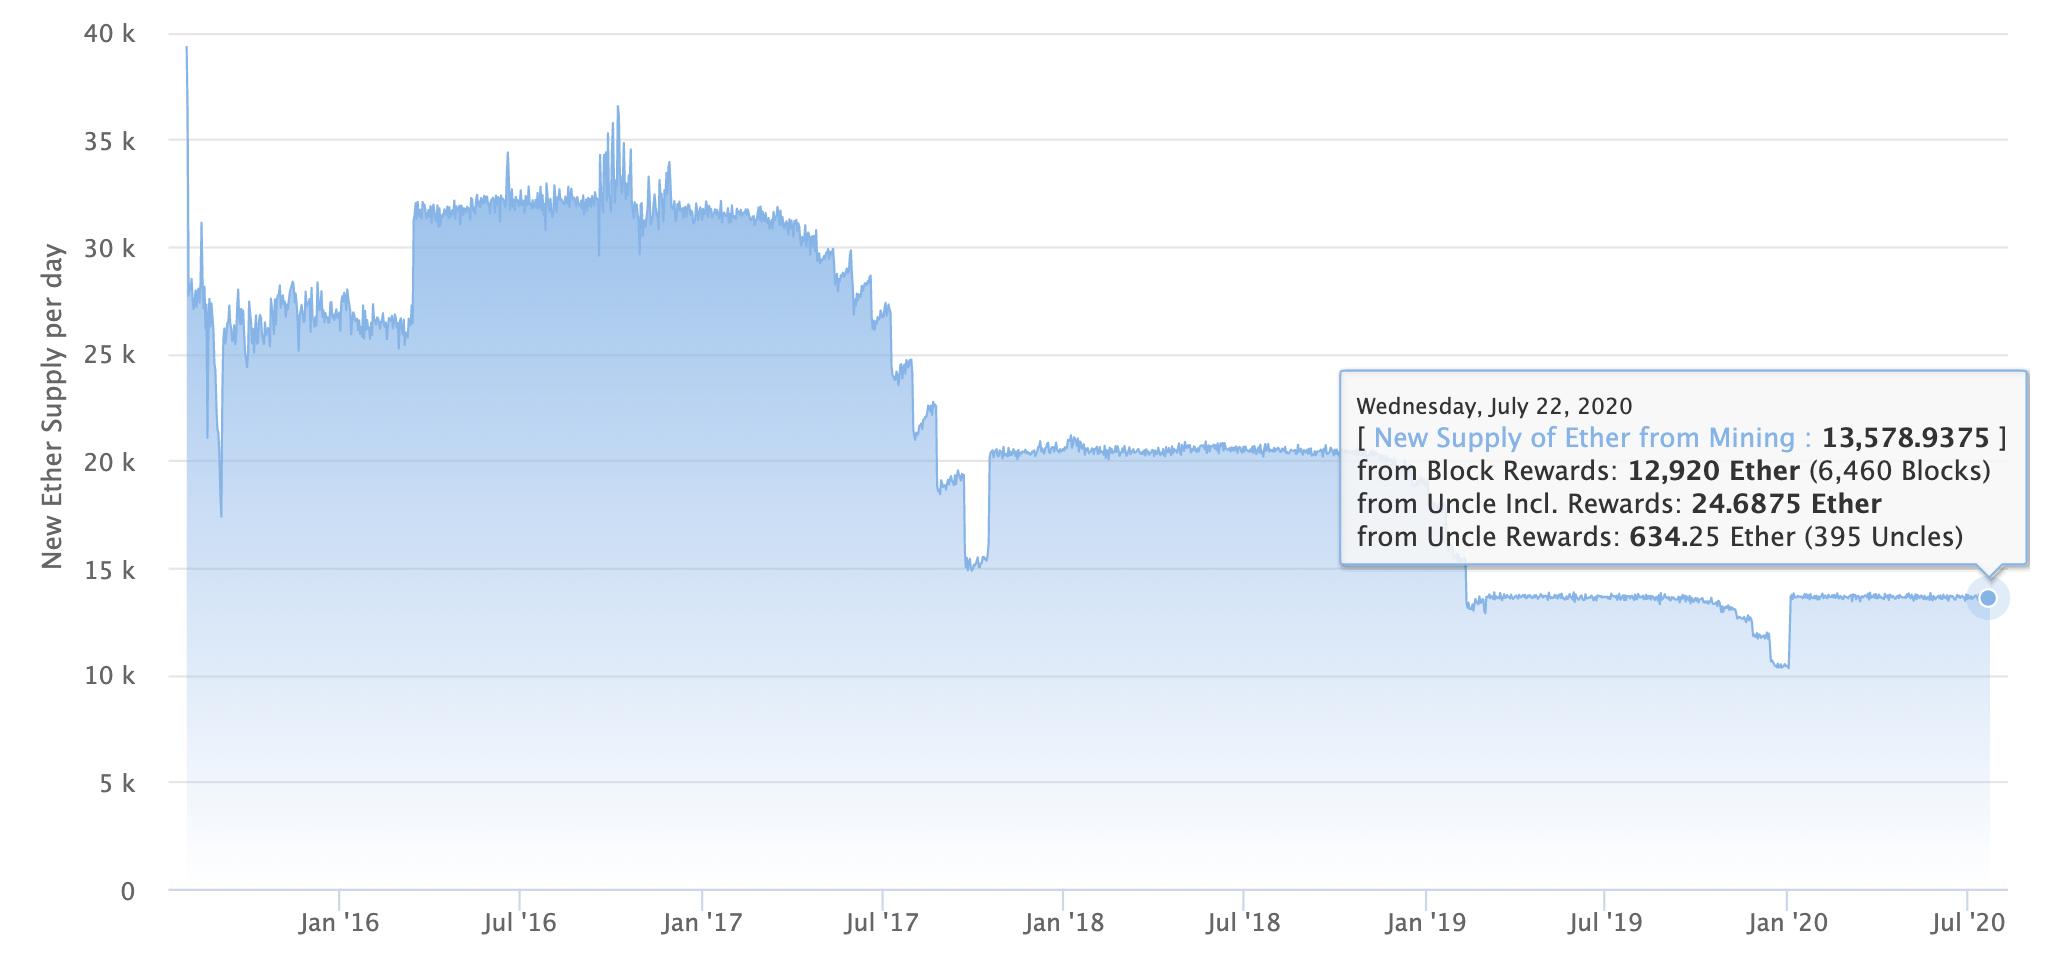 Ethereum daily block rewards, July 2020